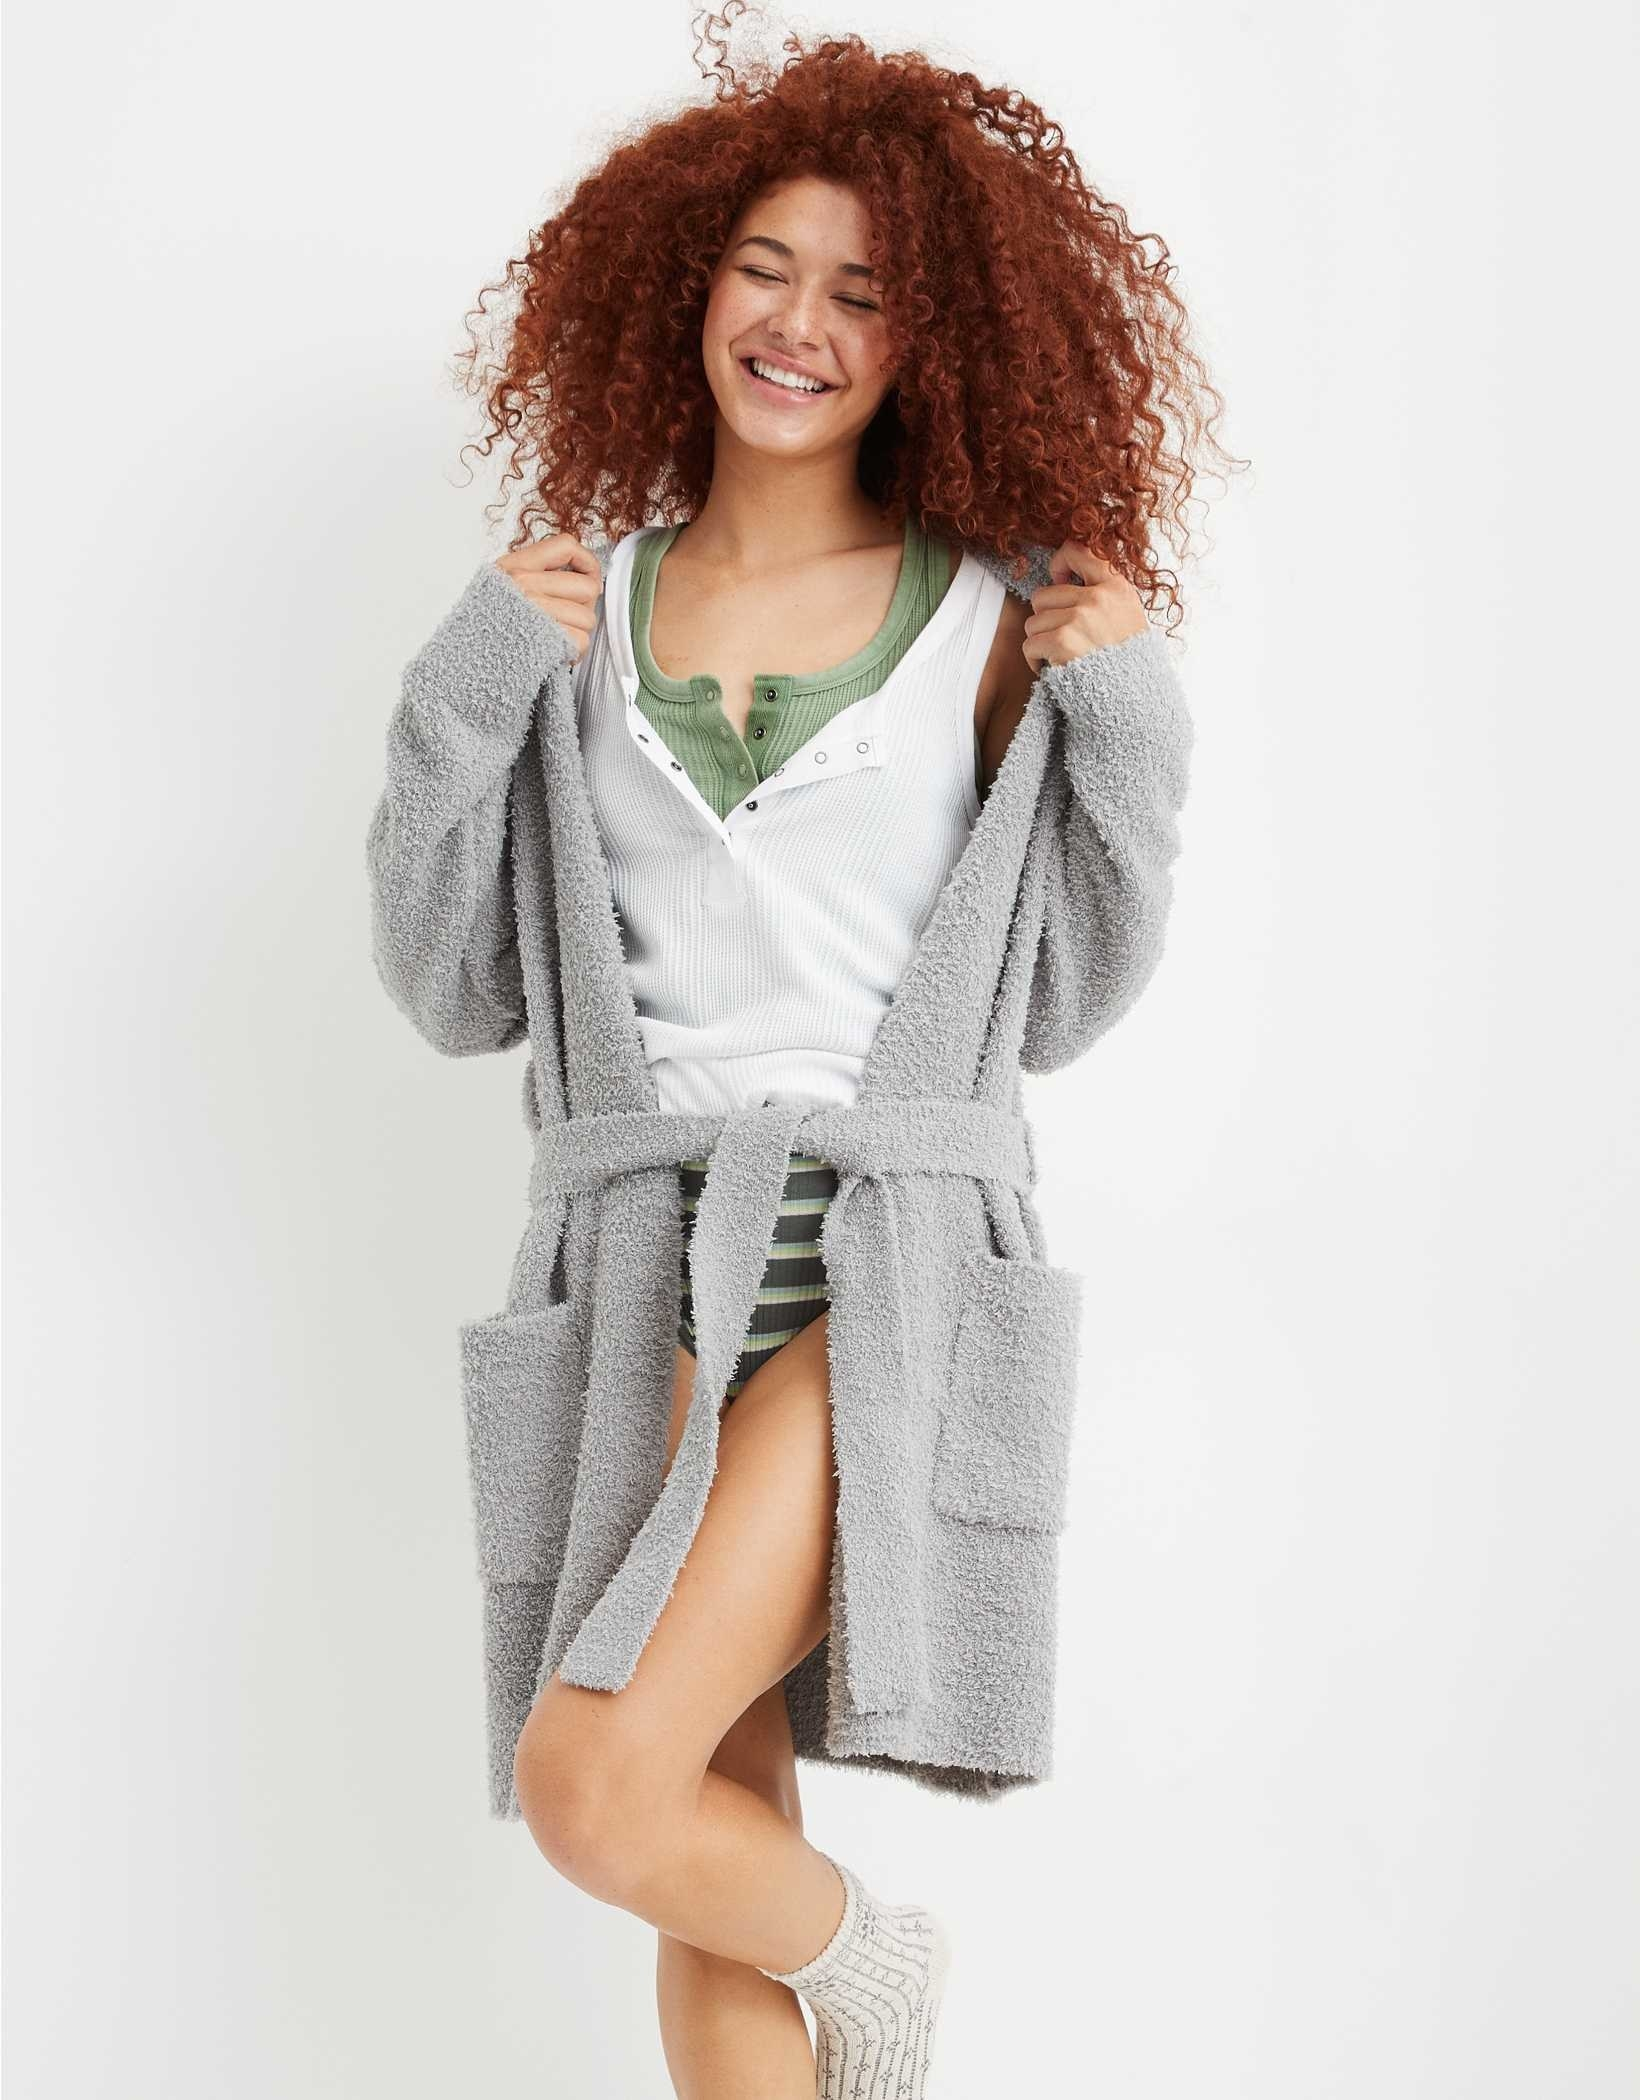 Model wearing the grey sleepigan